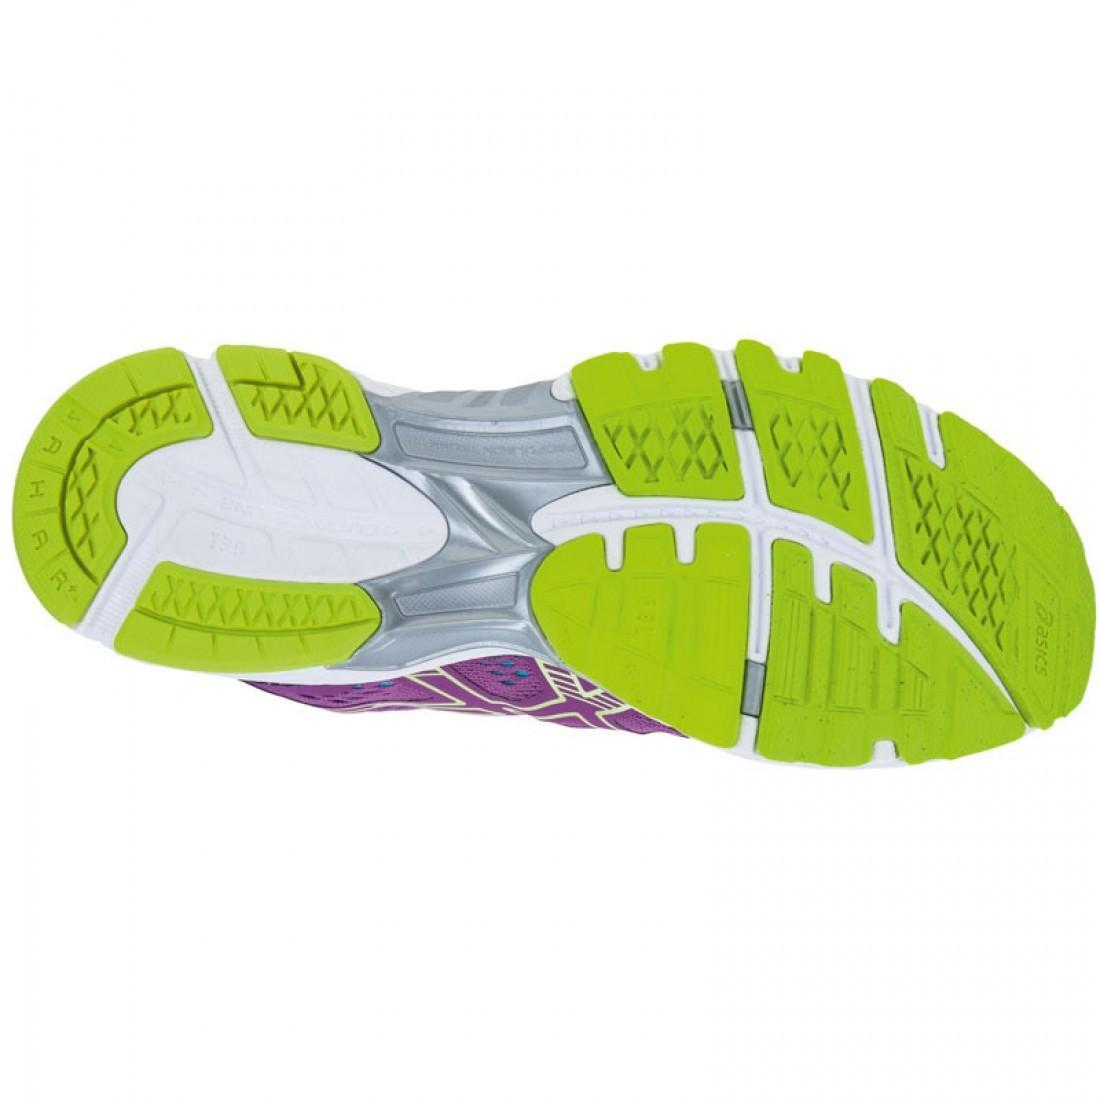 Asics Gel-DS Trainer NEUTRAL 19 кроссовки для бега женские